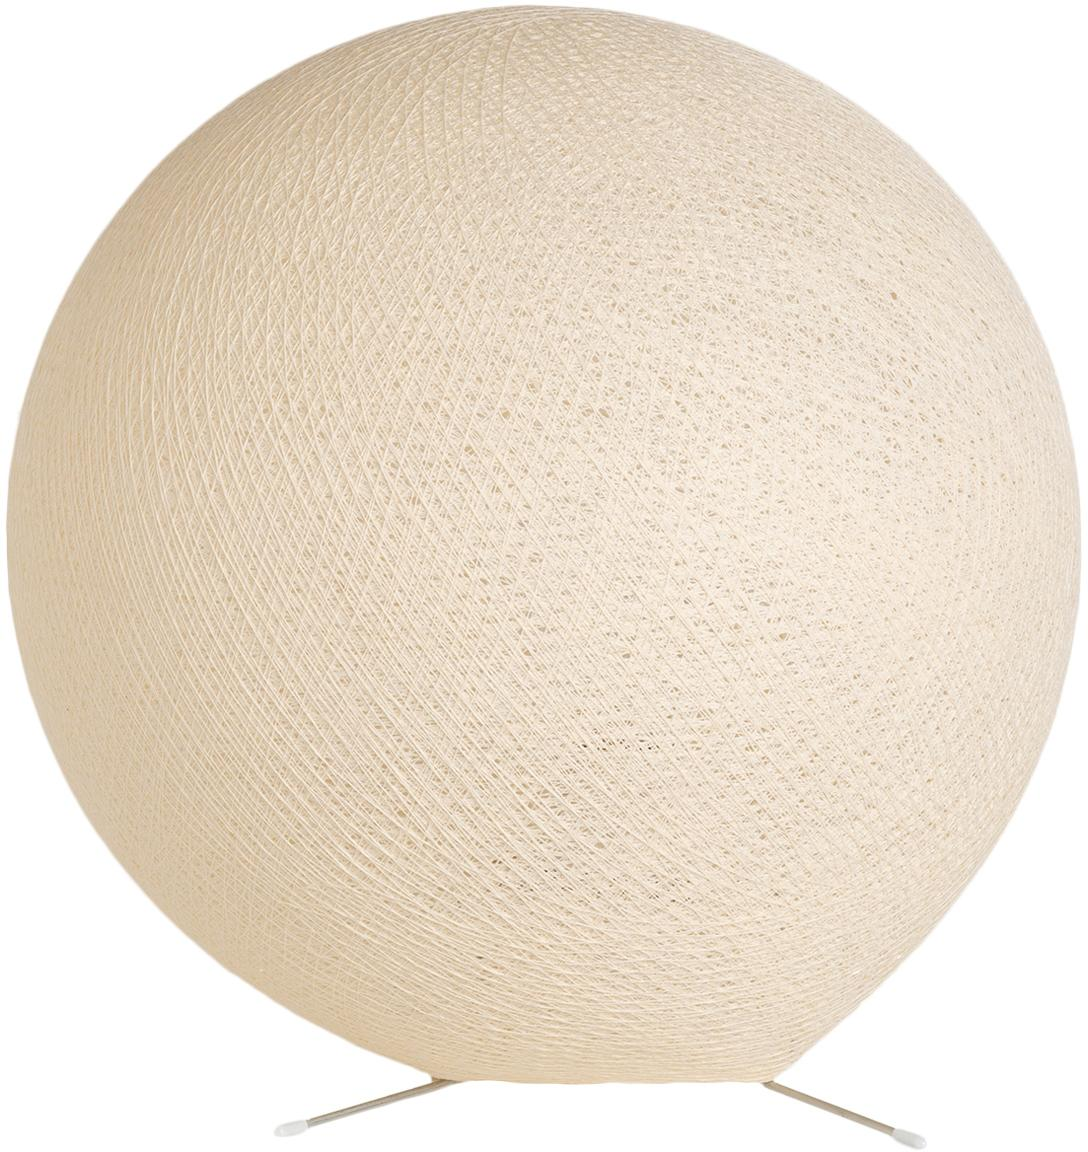 Tafellamp Colorain, Lampions: polyester, Beugel: metaal, Beige, Ø 36 cm